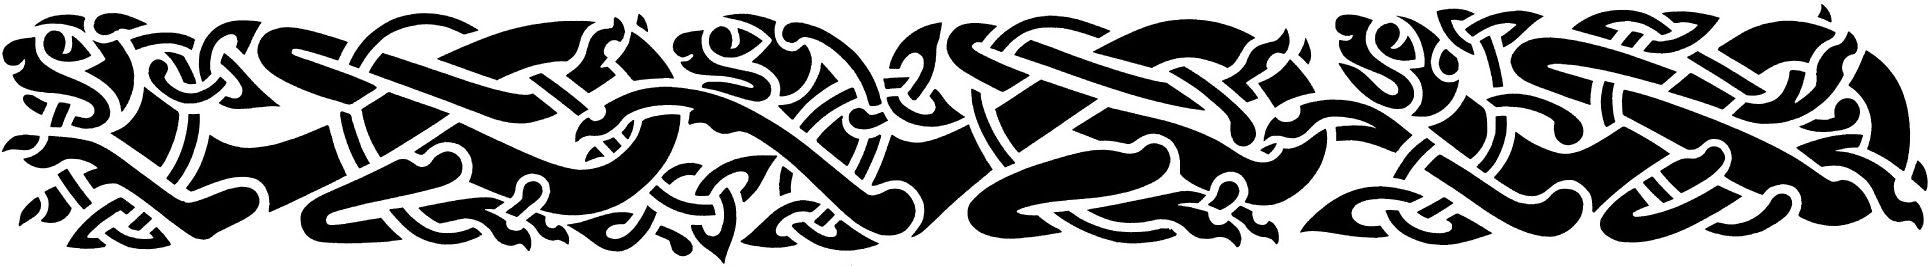 Ornamenty celtyckie